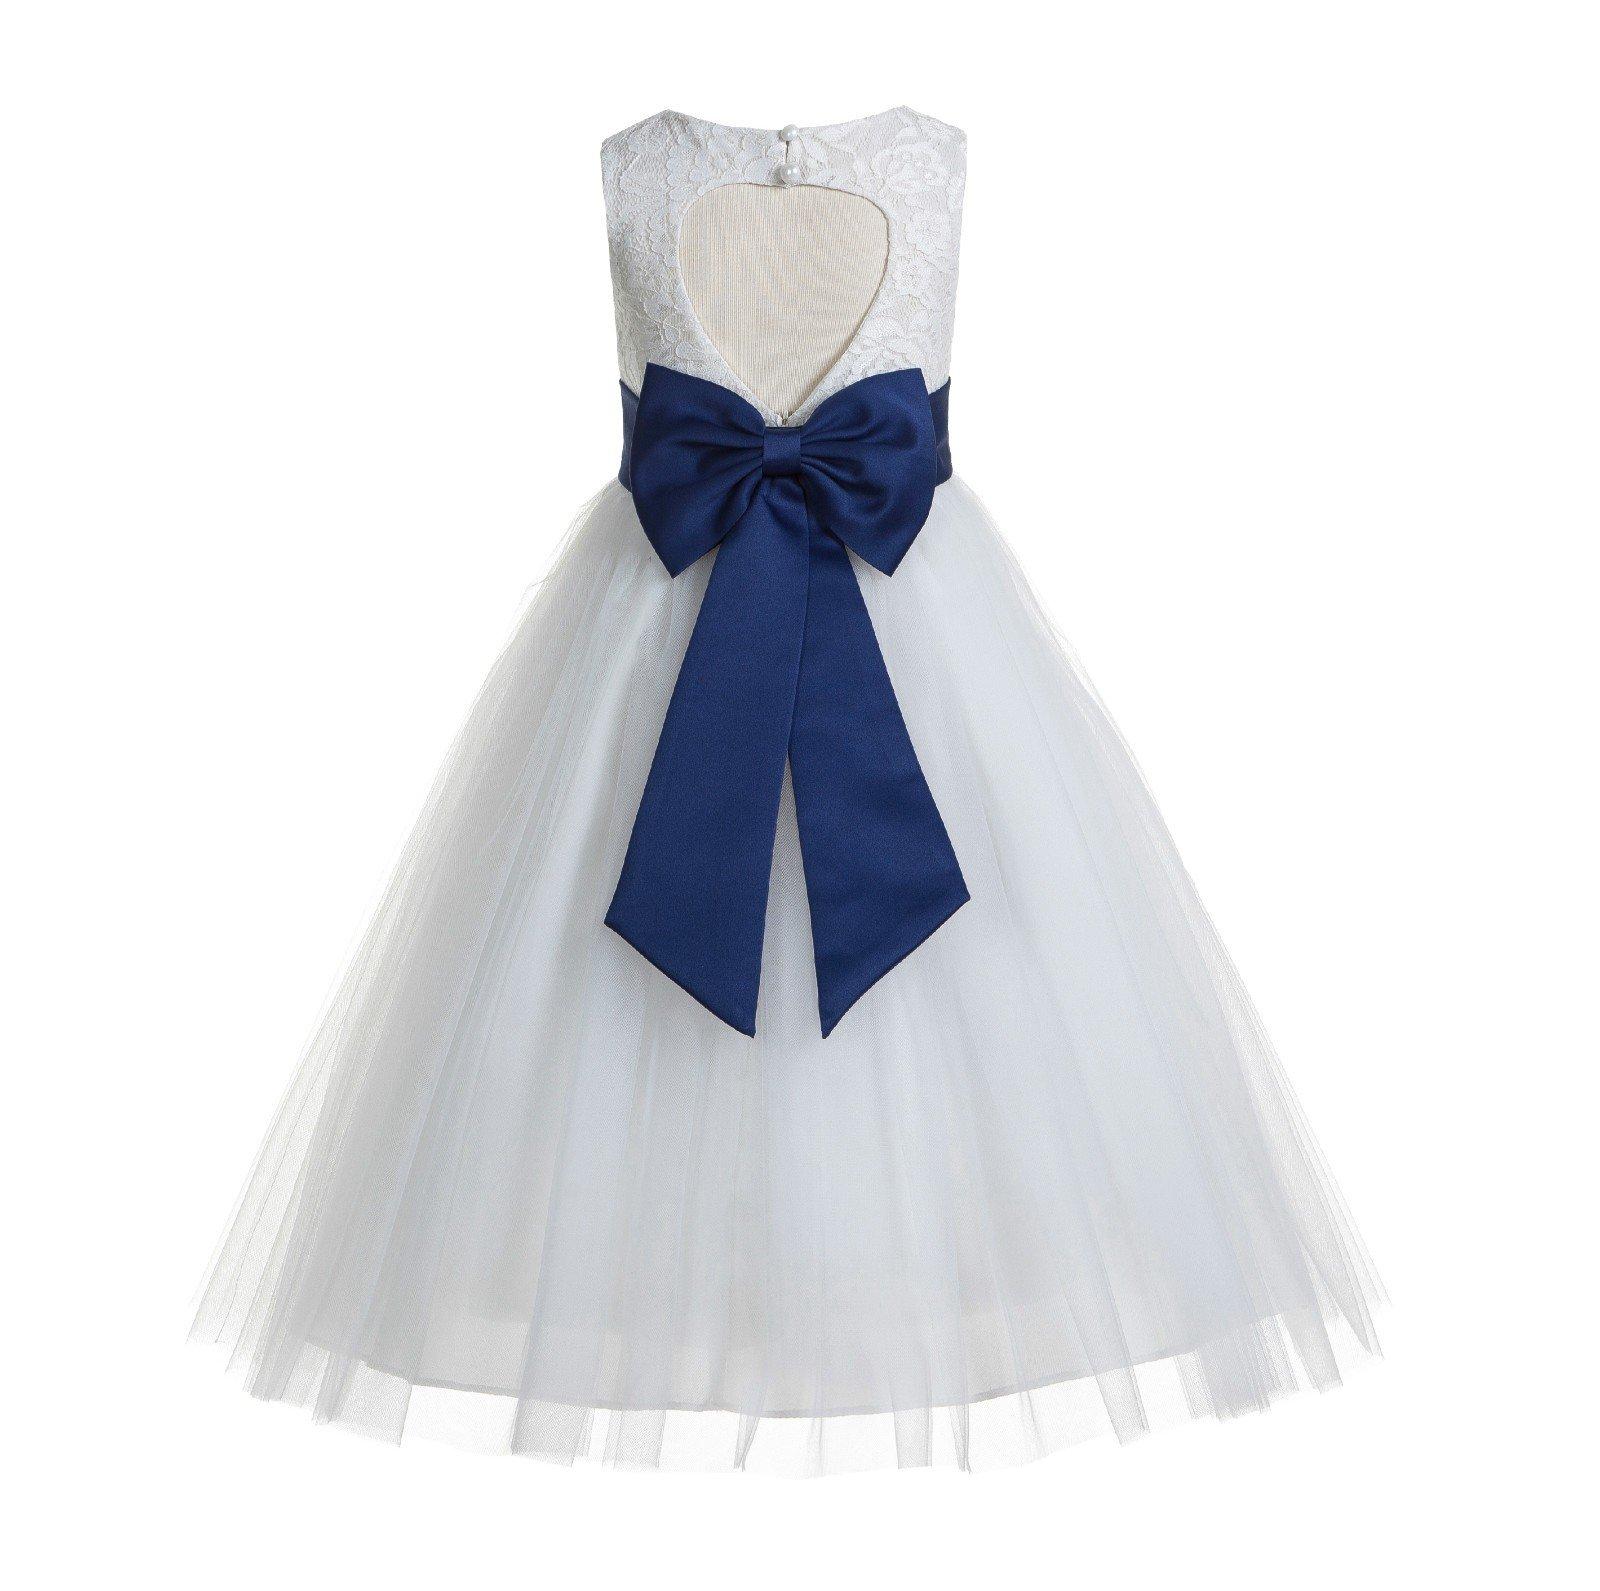 Navy blue and white dress for baby amazon ekidsbridal floral lace heart cutout white flower girl dresses holy communion dress baptism dresses 172t izmirmasajfo